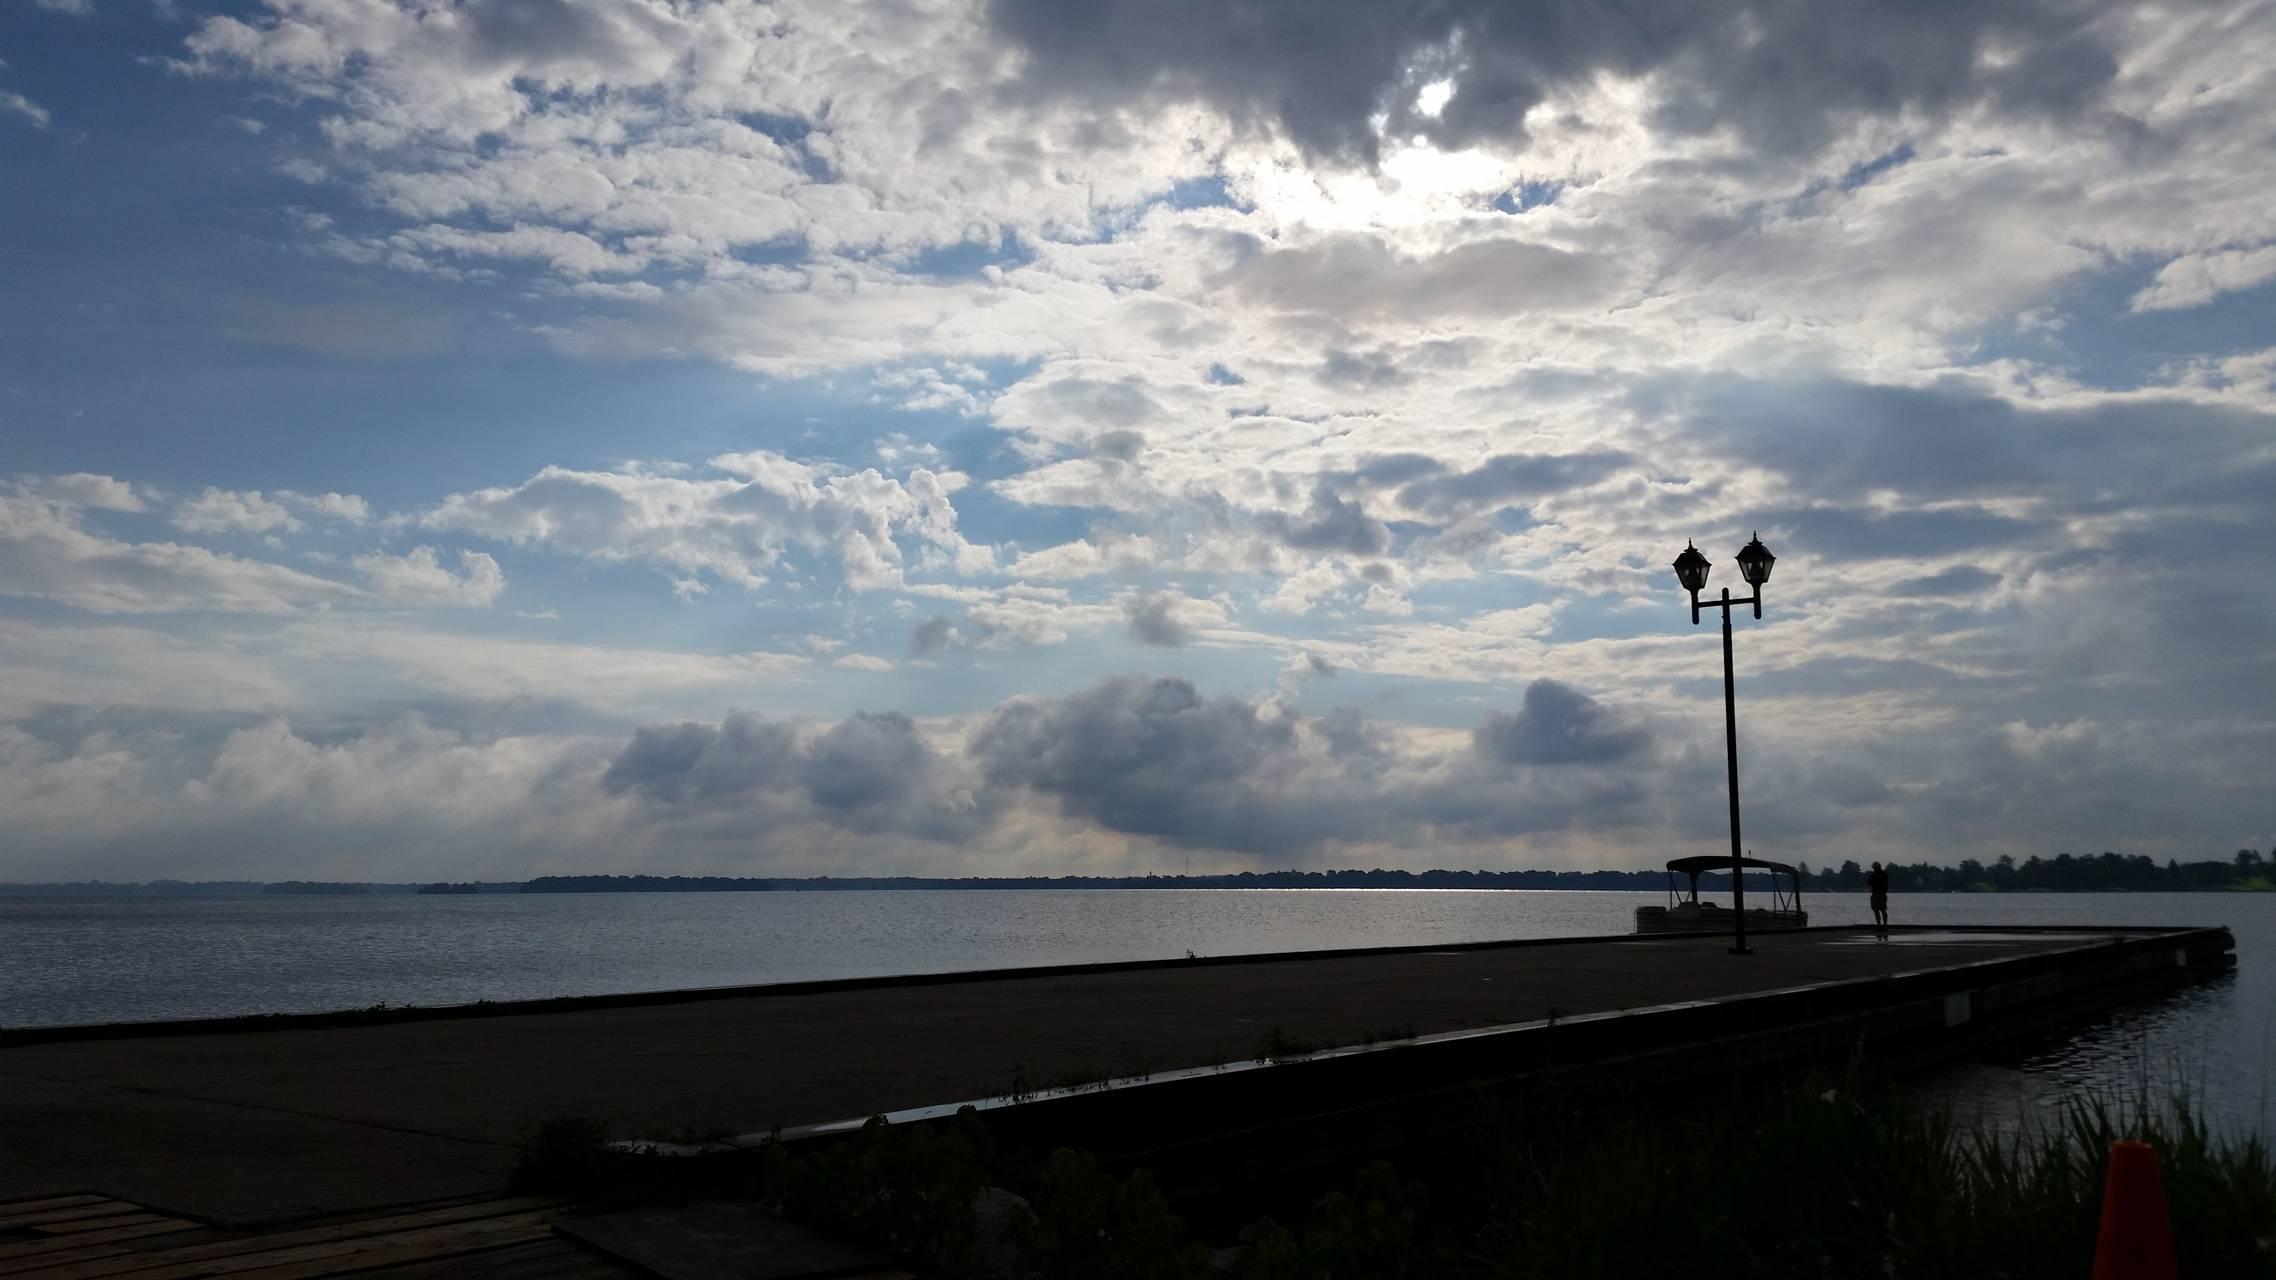 Cloudy Docks